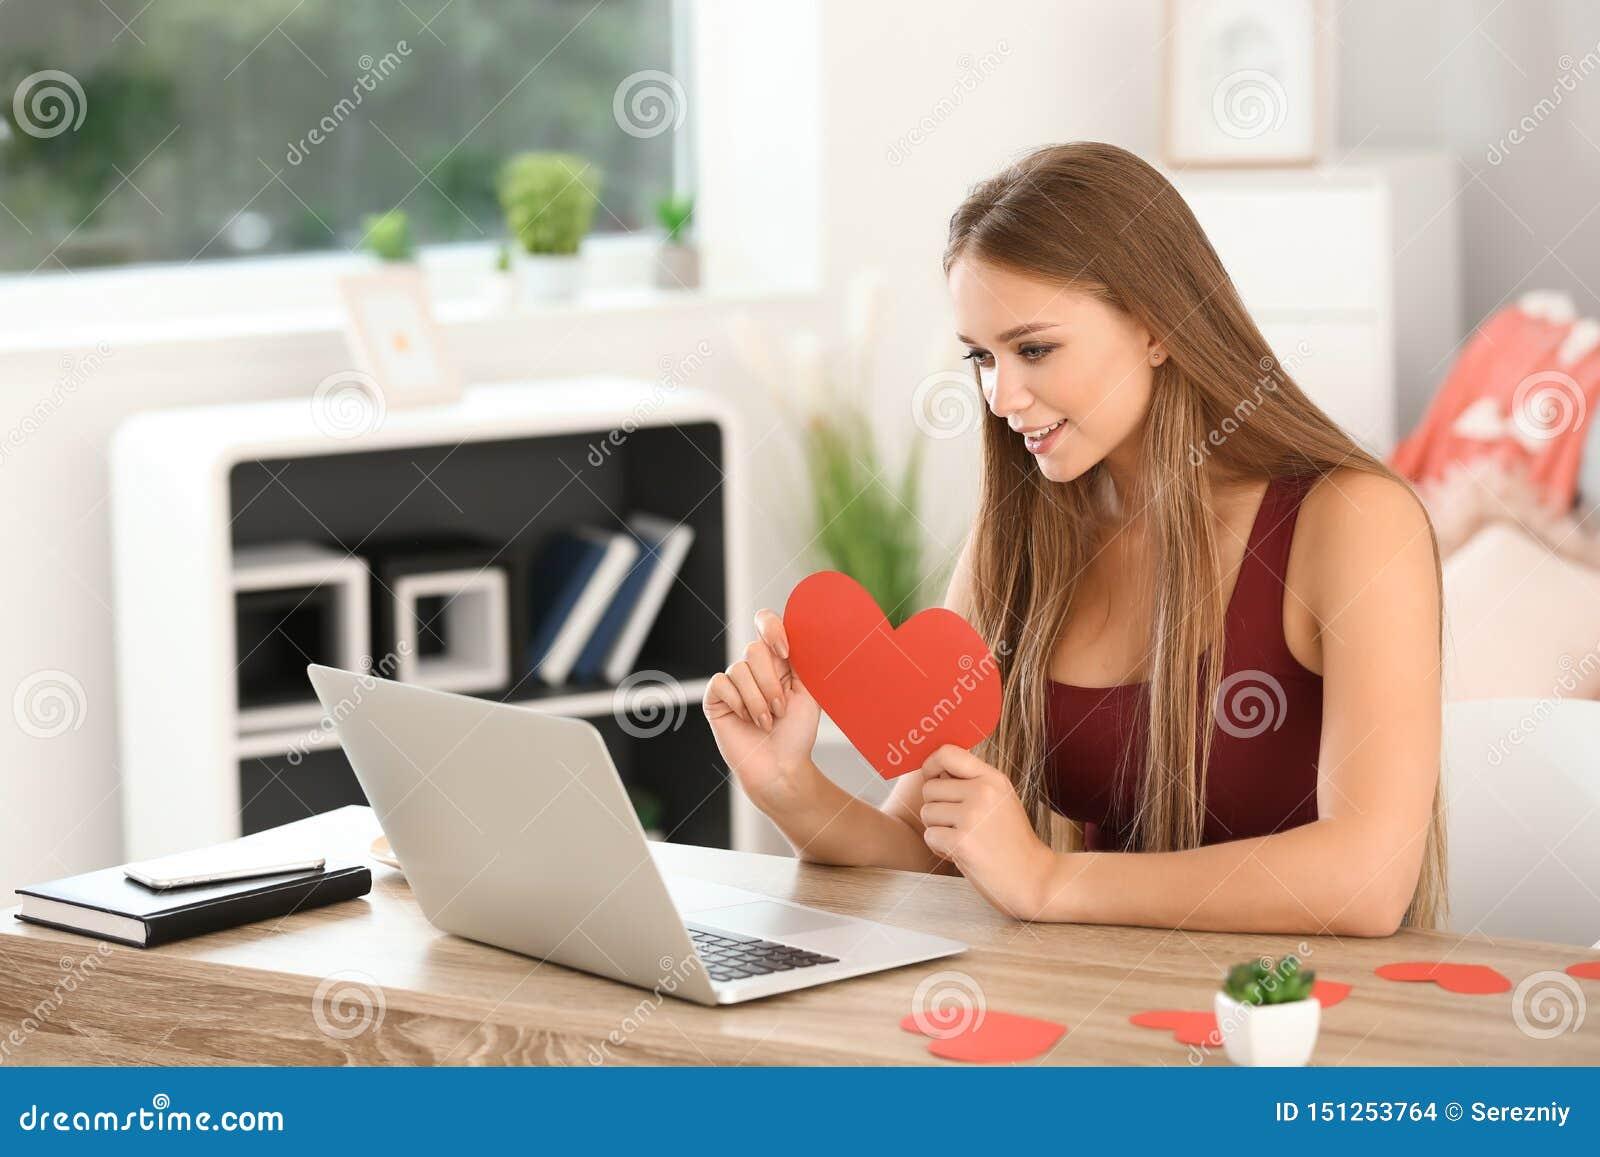 Search for: ❤️ Întâlniri pentru mine: www.Dating4Me.site ❤️ Vaza Sticla Online Dating